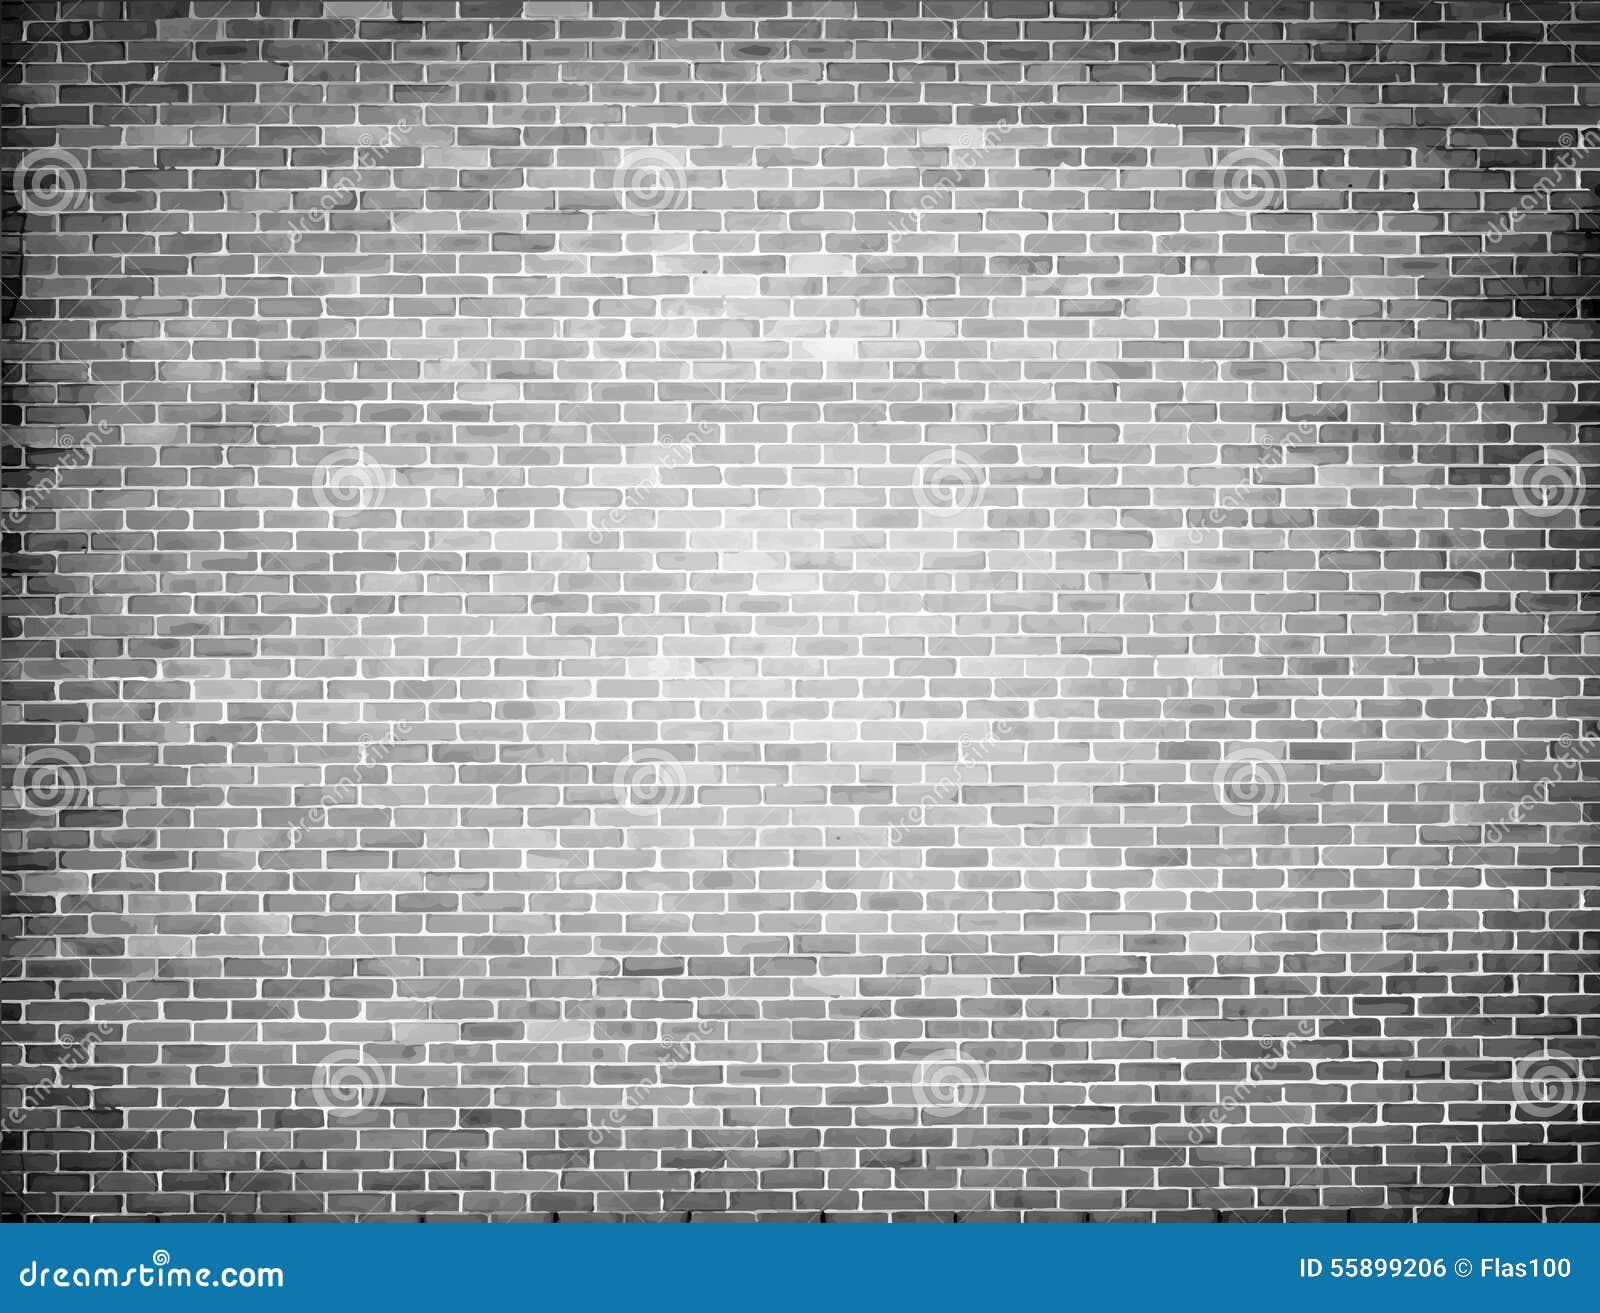 Grunge Brick Wall Texture  Vector Background Stock Vector